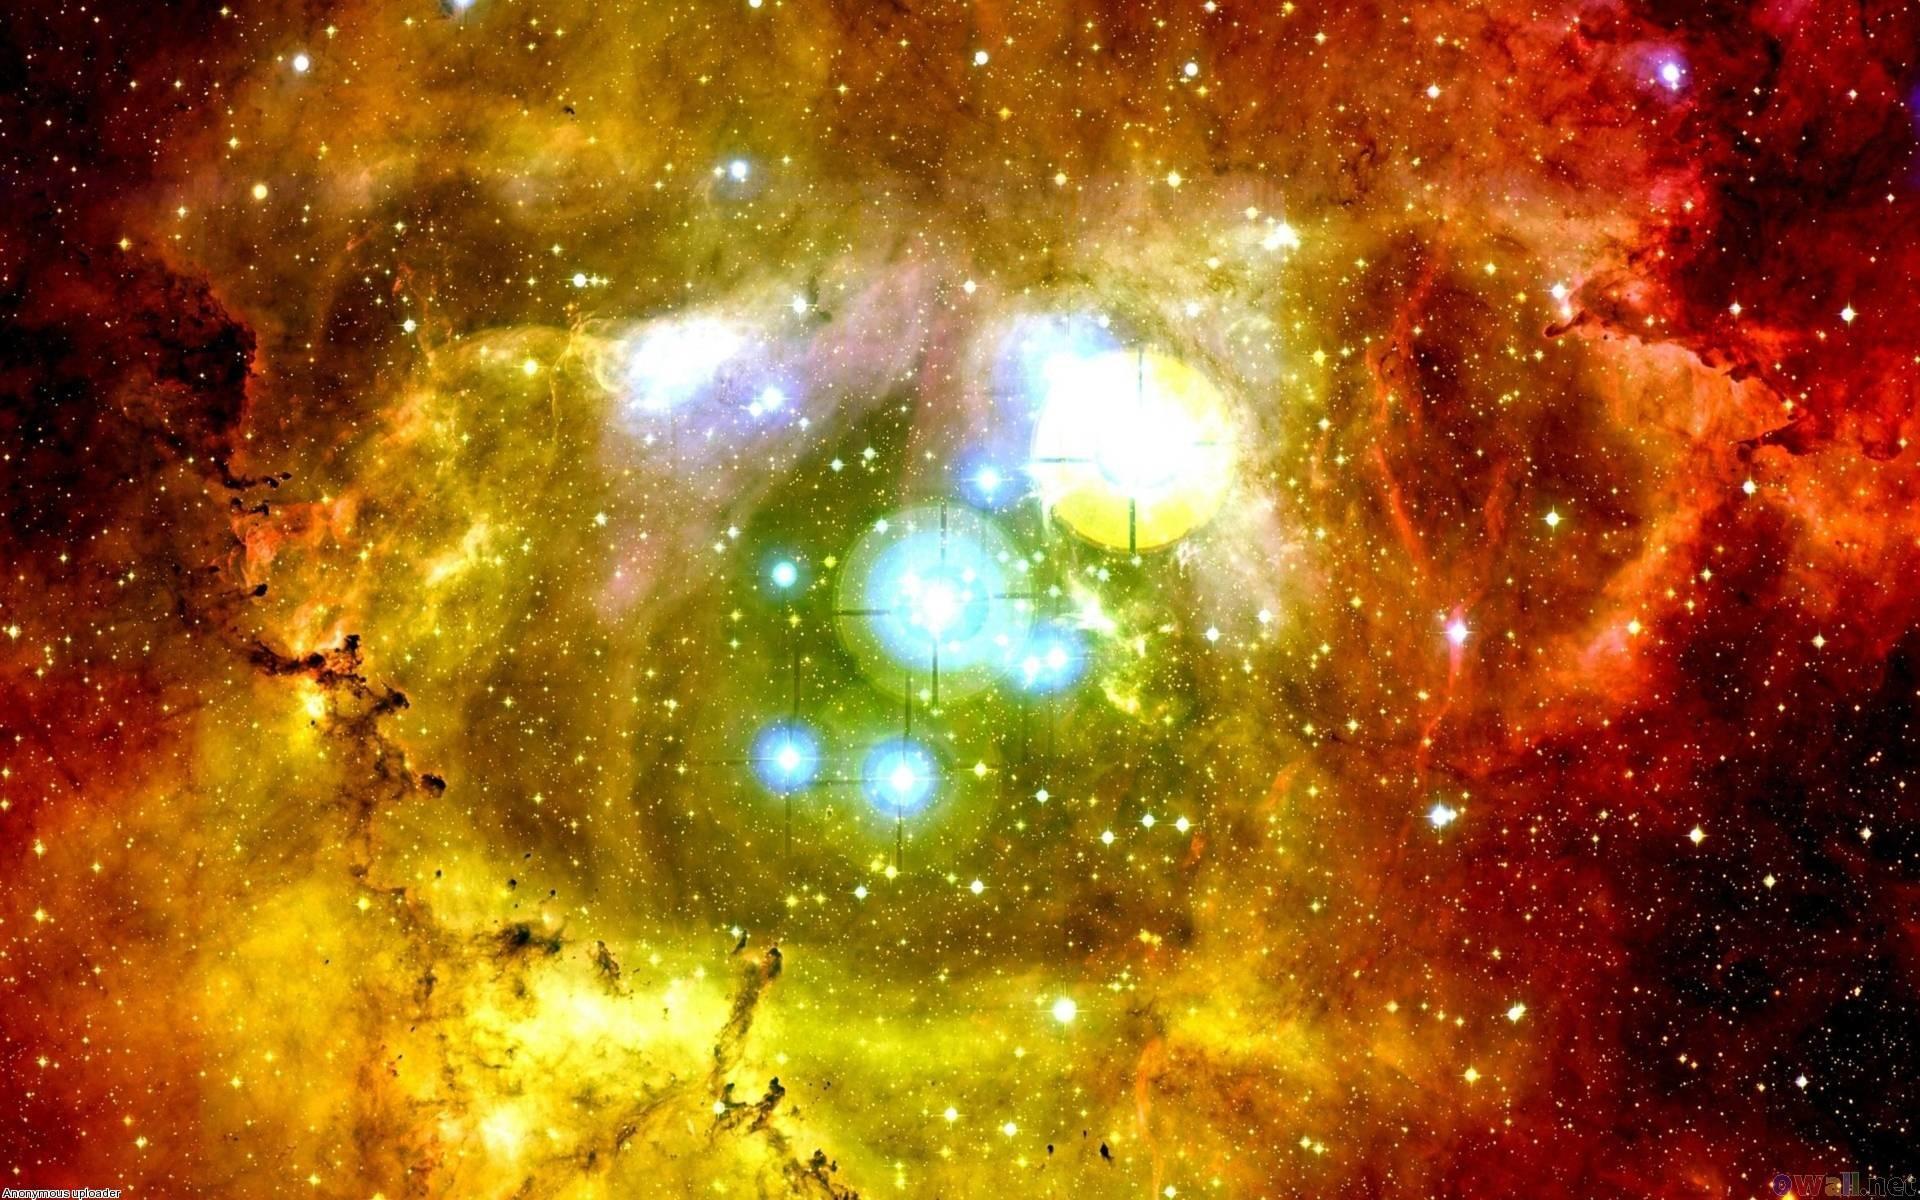 Wallpapers For > Real Supernova Wallpaper